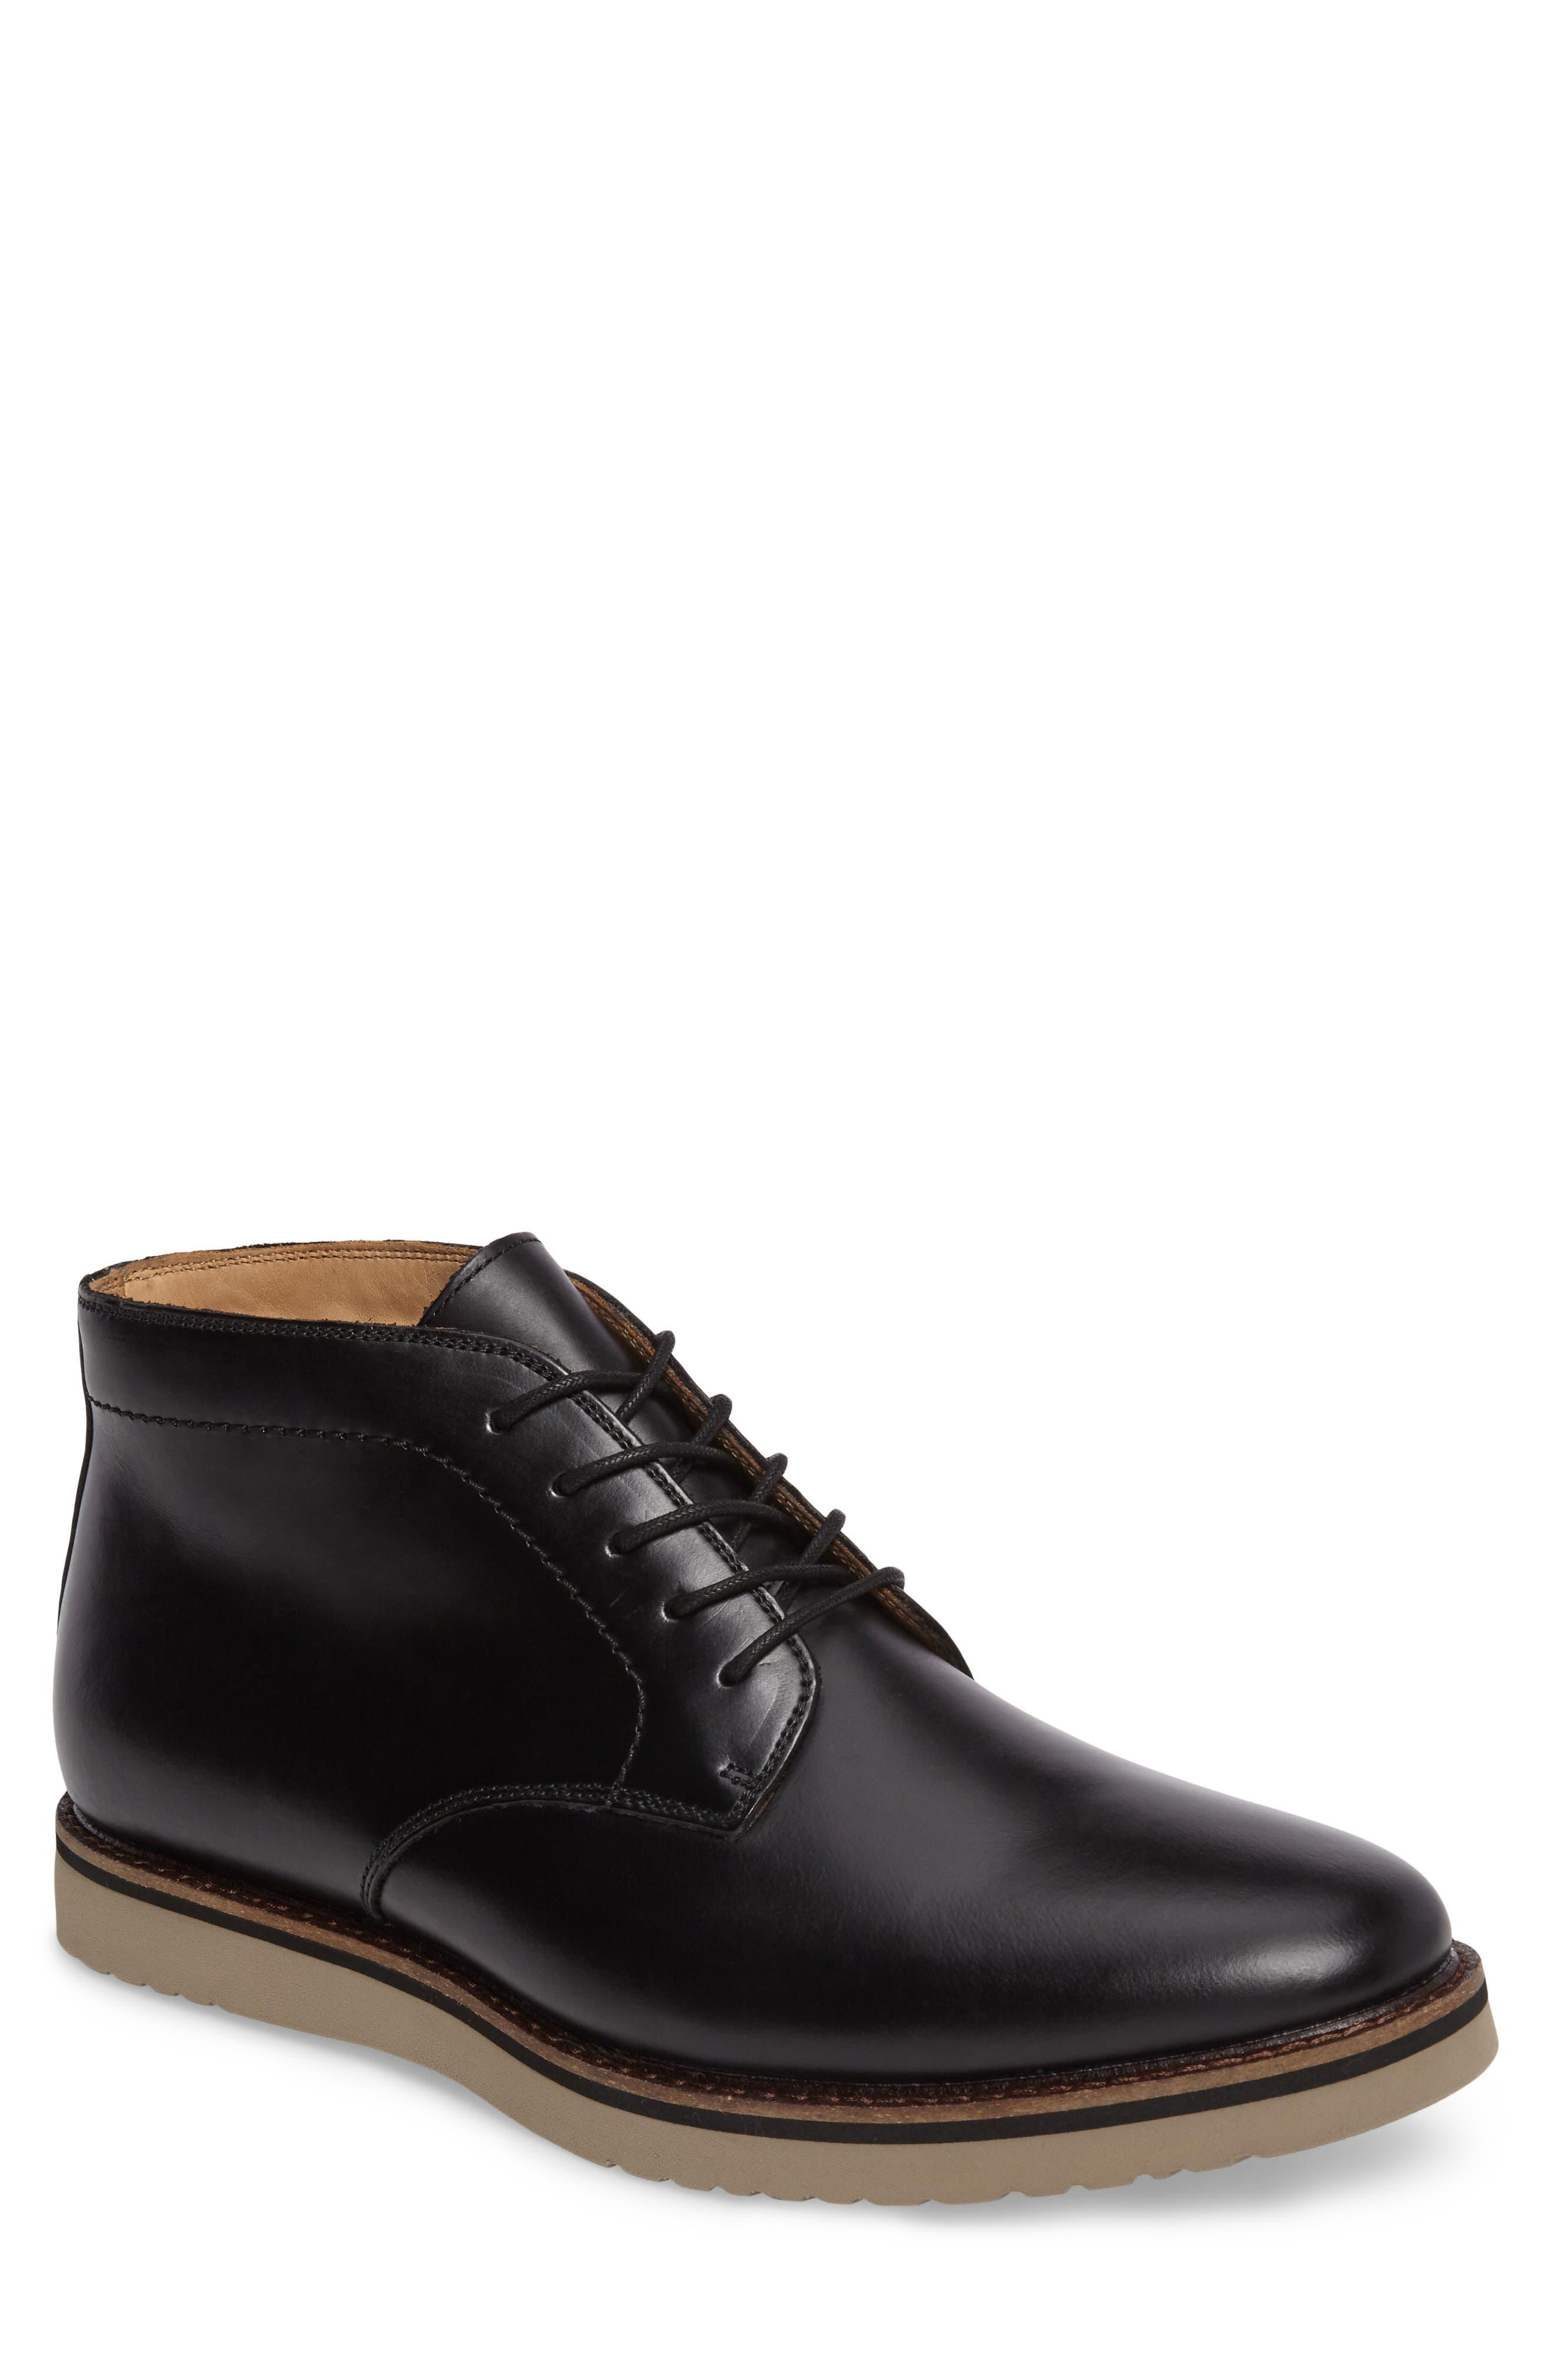 'Farley' Chukka Boot,                             Main thumbnail 1, color,                             Black/ Black Leather